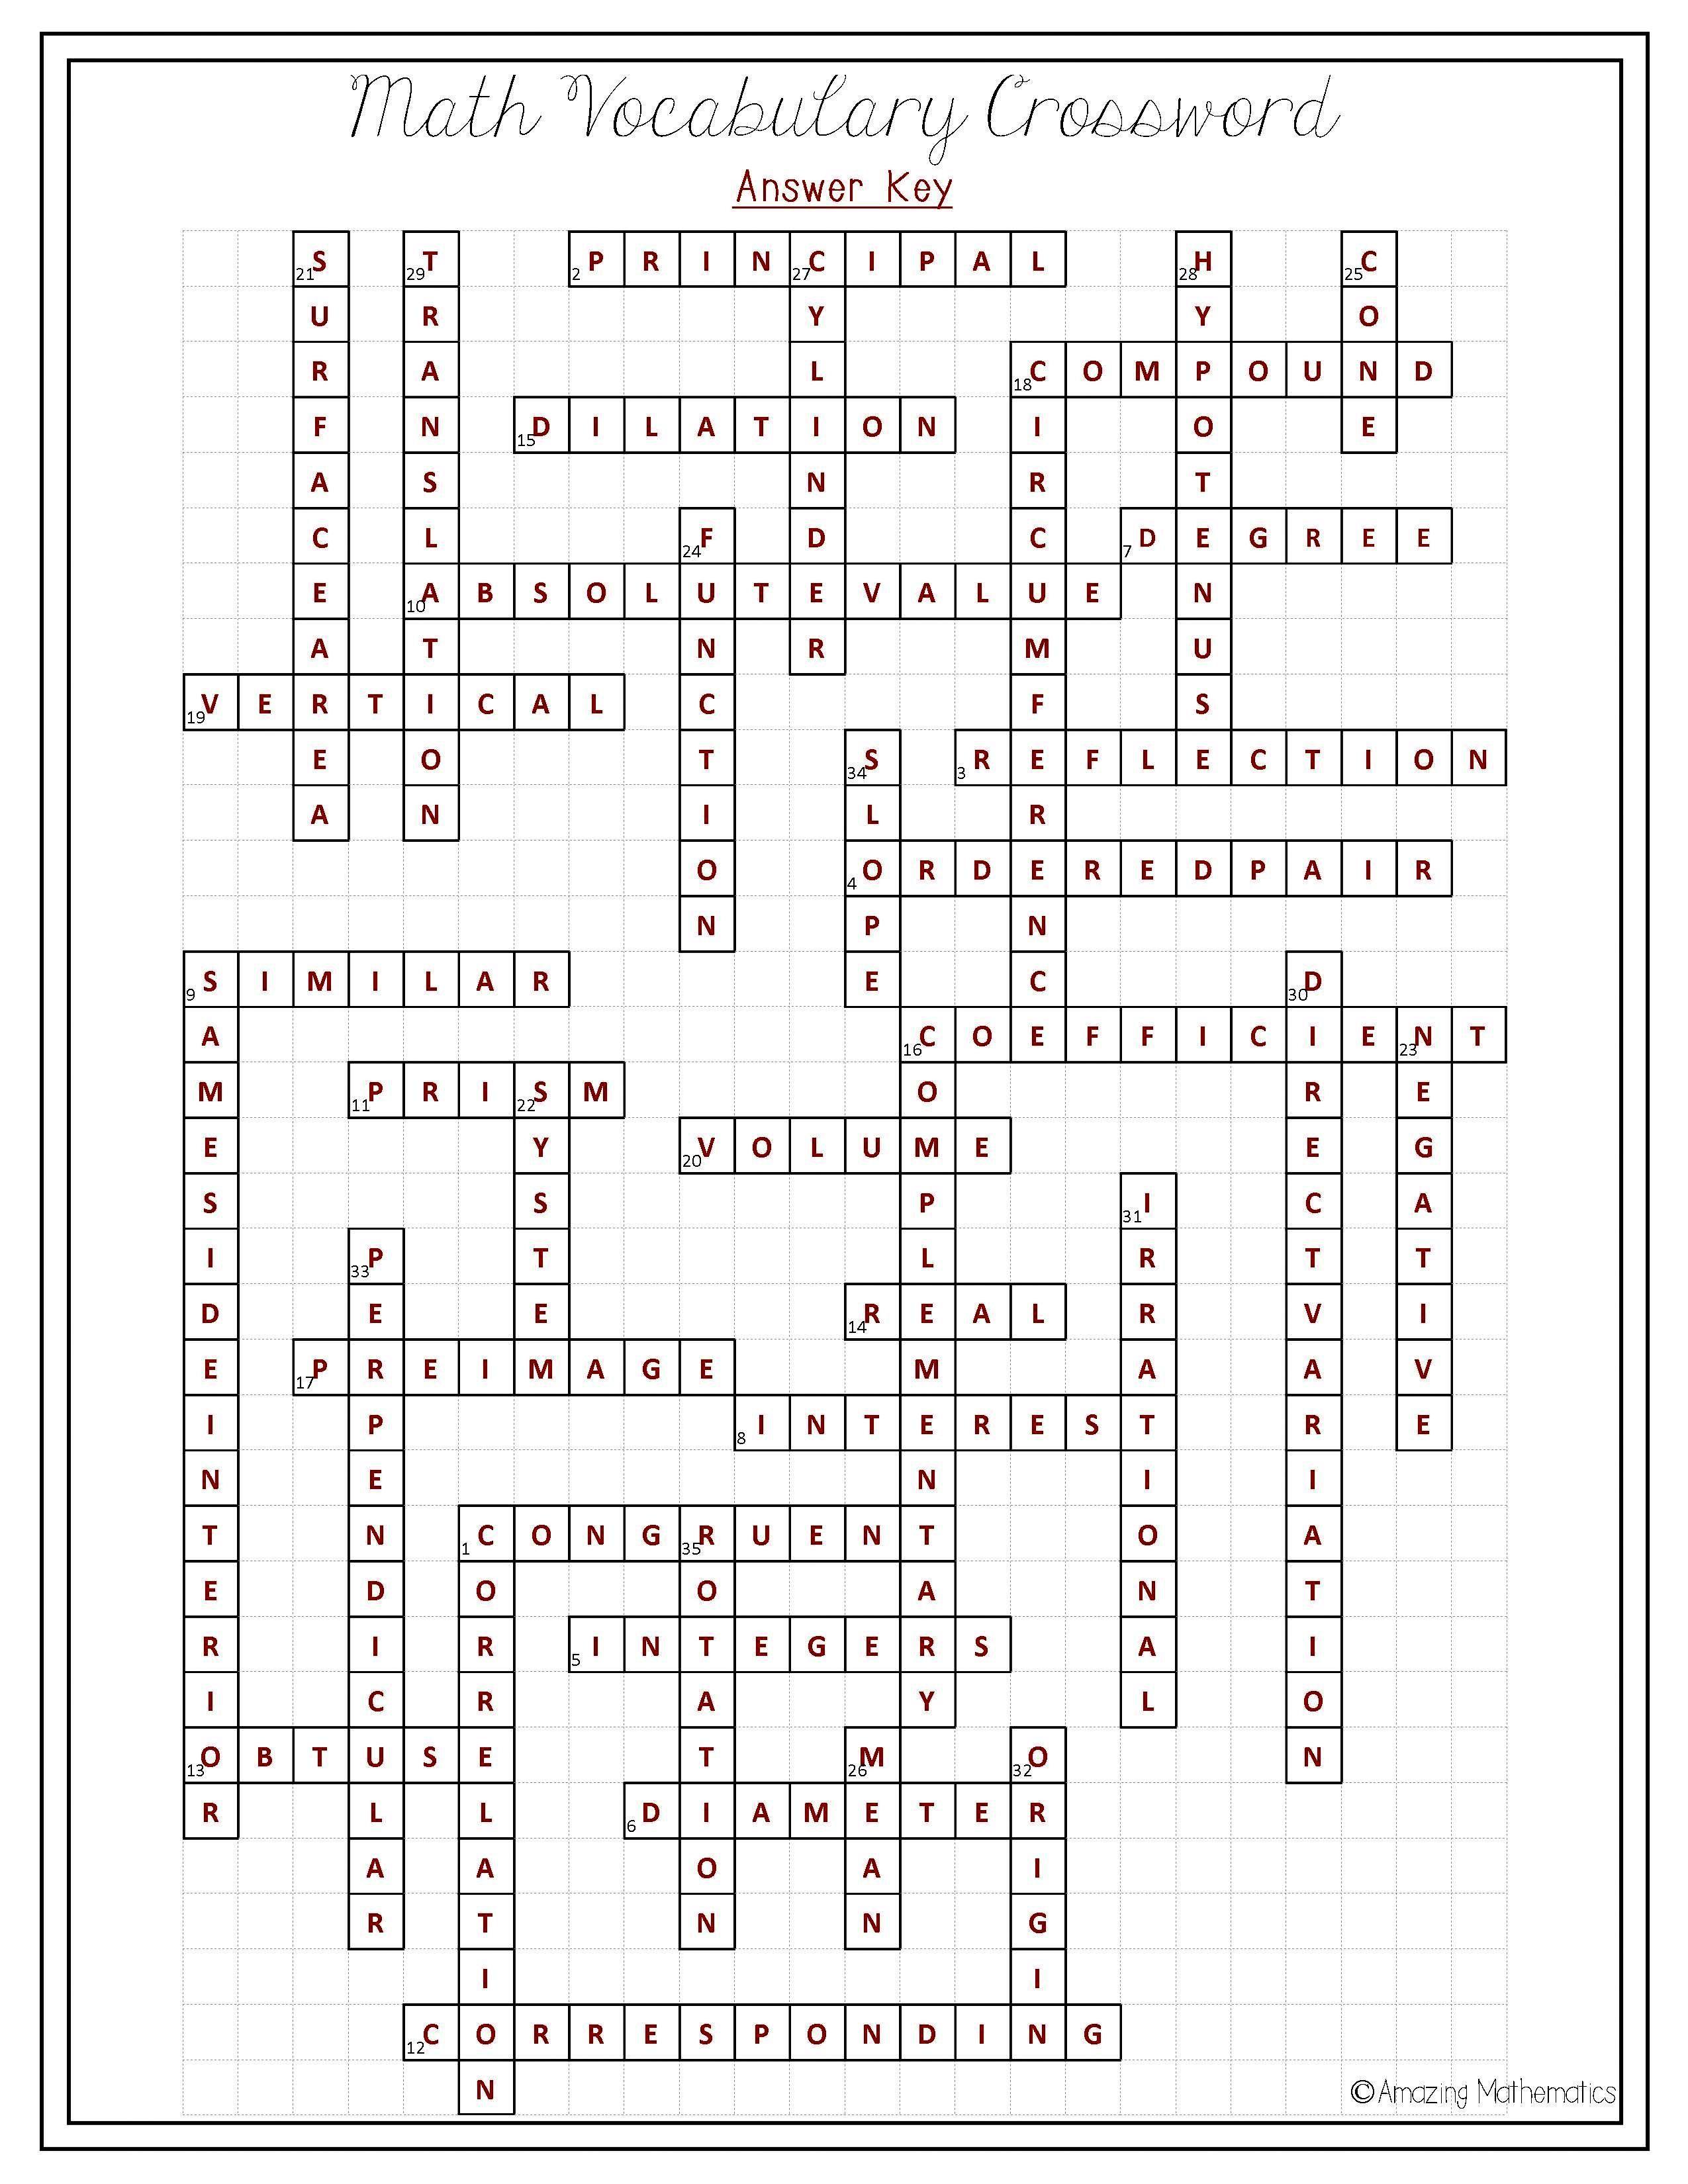 8Th Grade Math Vocabulary Crossword   Puzzles   Math Vocabulary, 8Th - Math Vocabulary Crossword Puzzles Printable